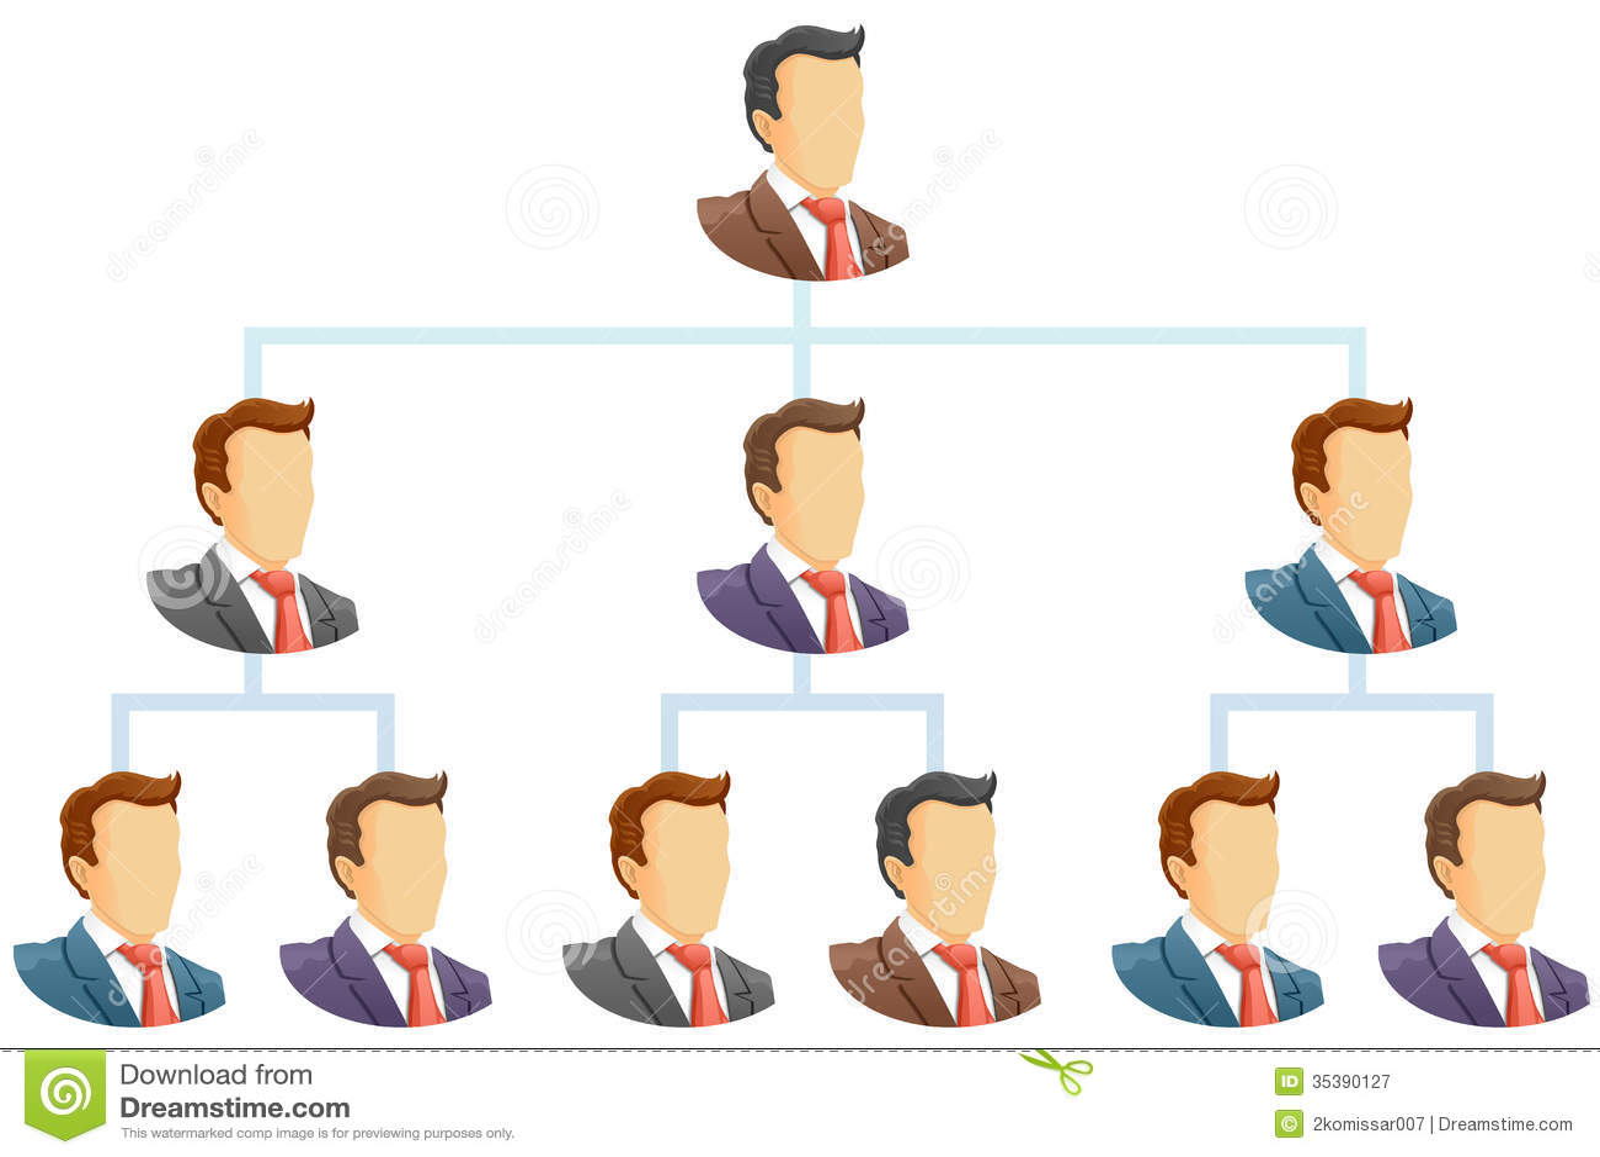 office organization chart template